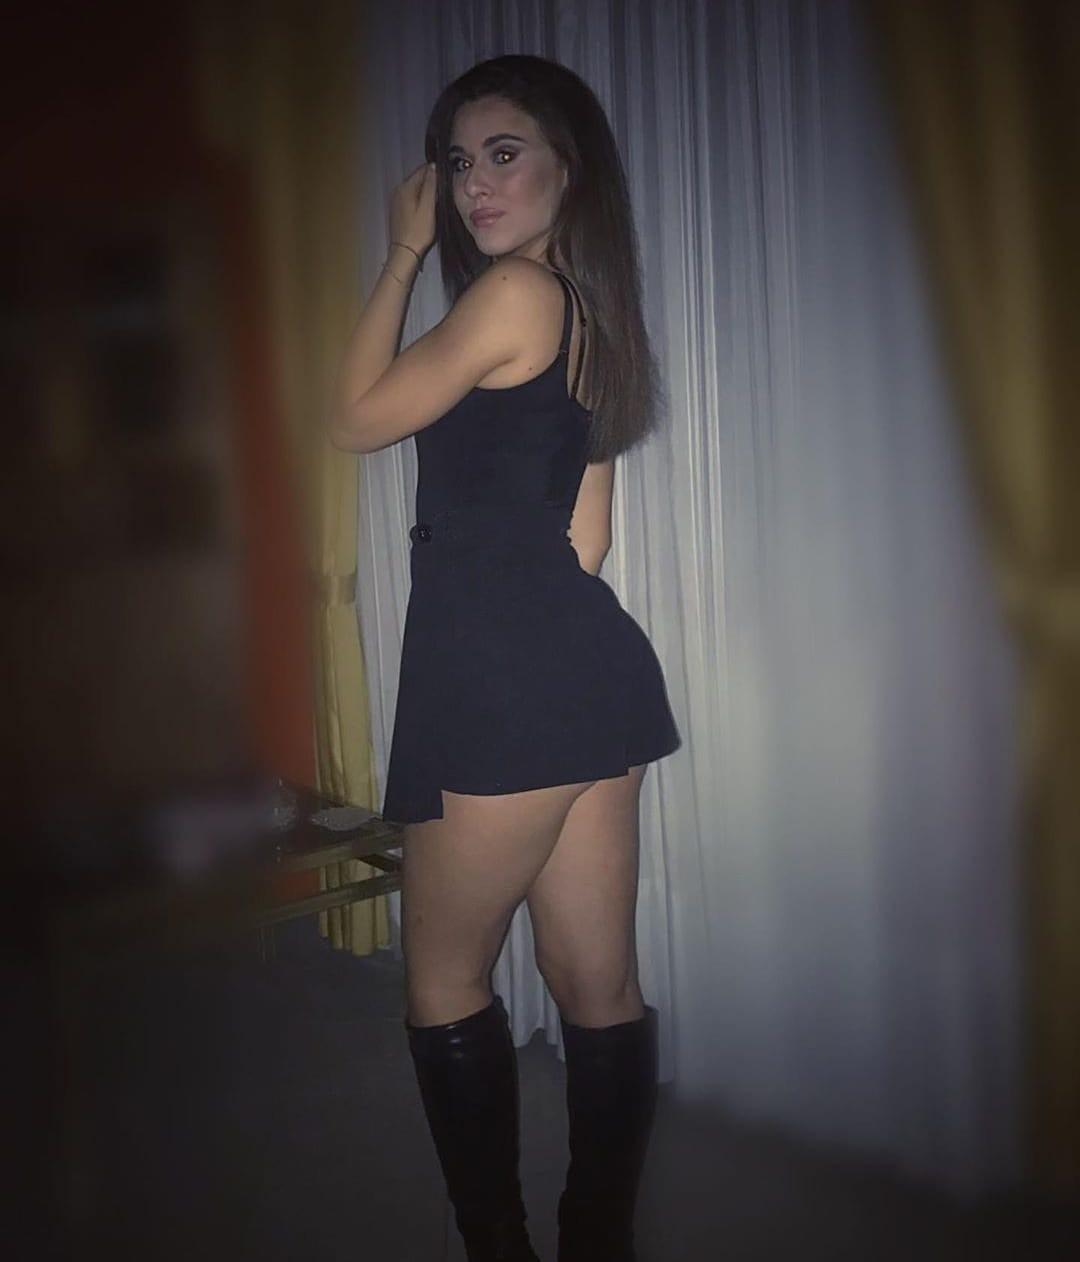 Cute Hot Girls On The Instagram, Photo shoot, Black hair